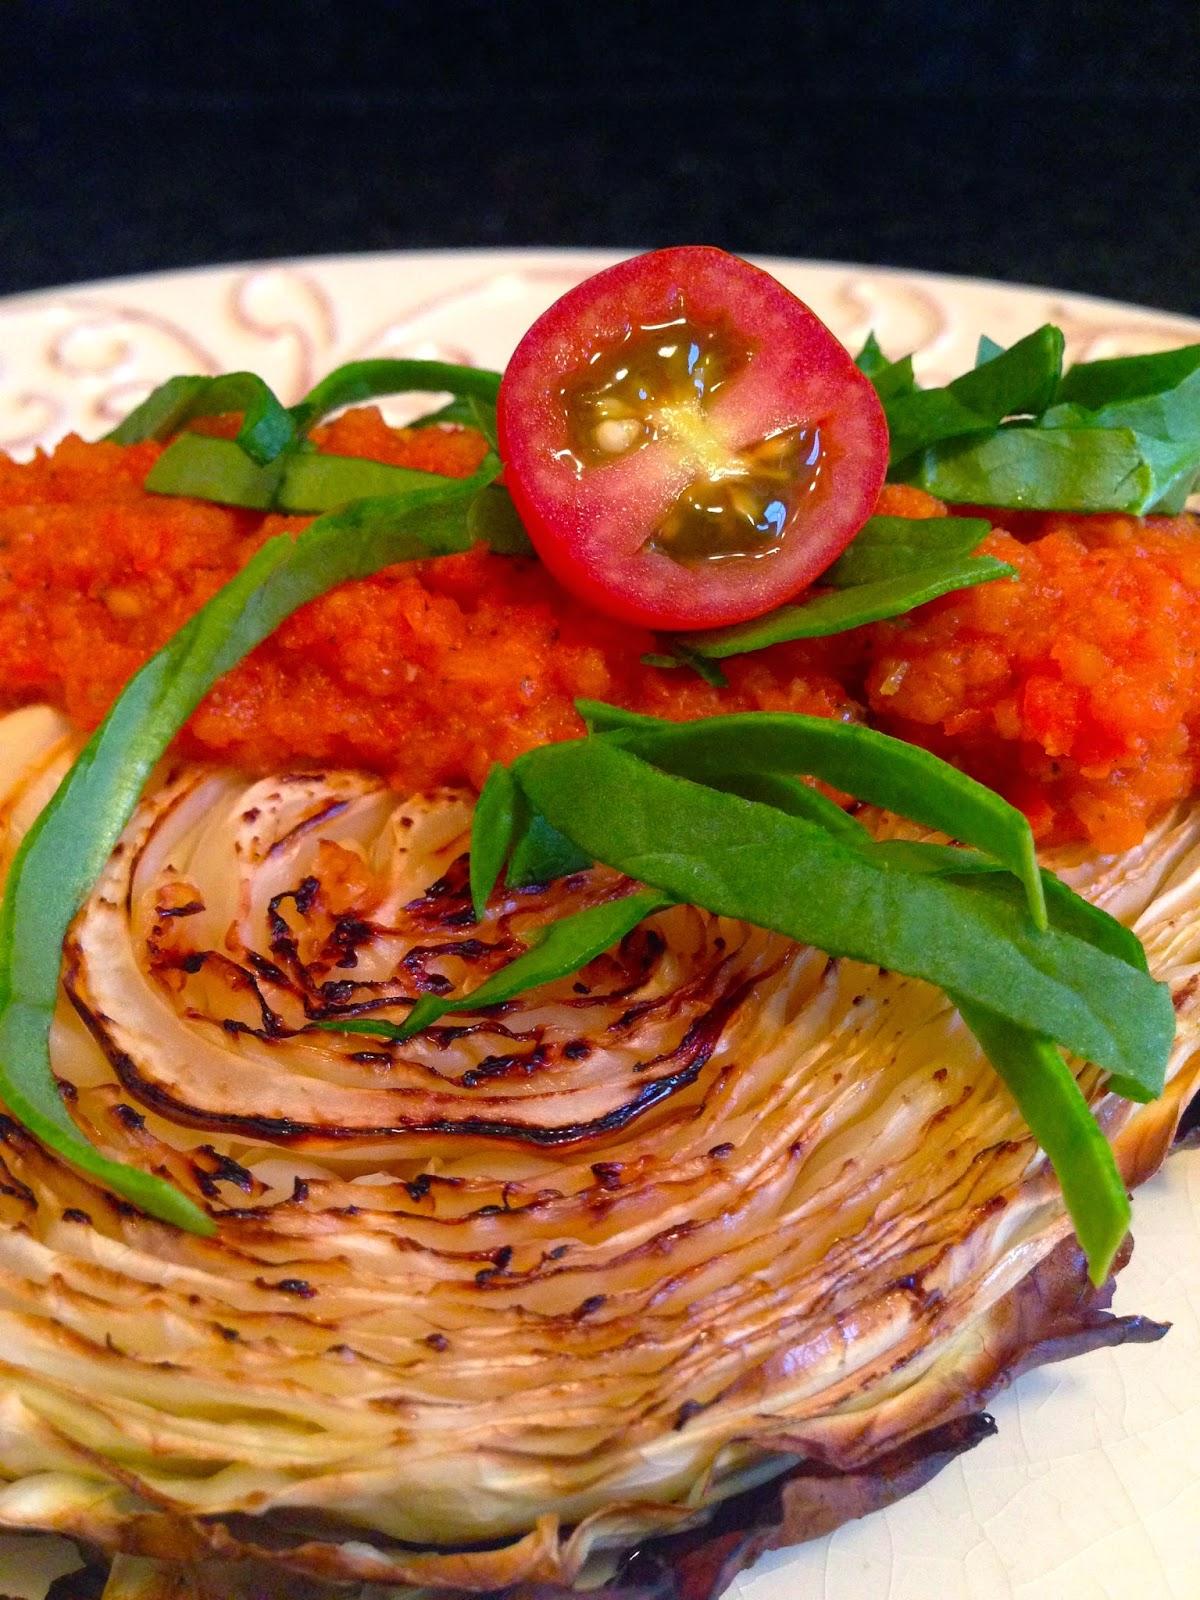 Oven Roasted Cabbage Steak recipe by BeautyBeyondBones. #glutenfree #vegan #paleo #specificcarbohydratediet #vegetarian